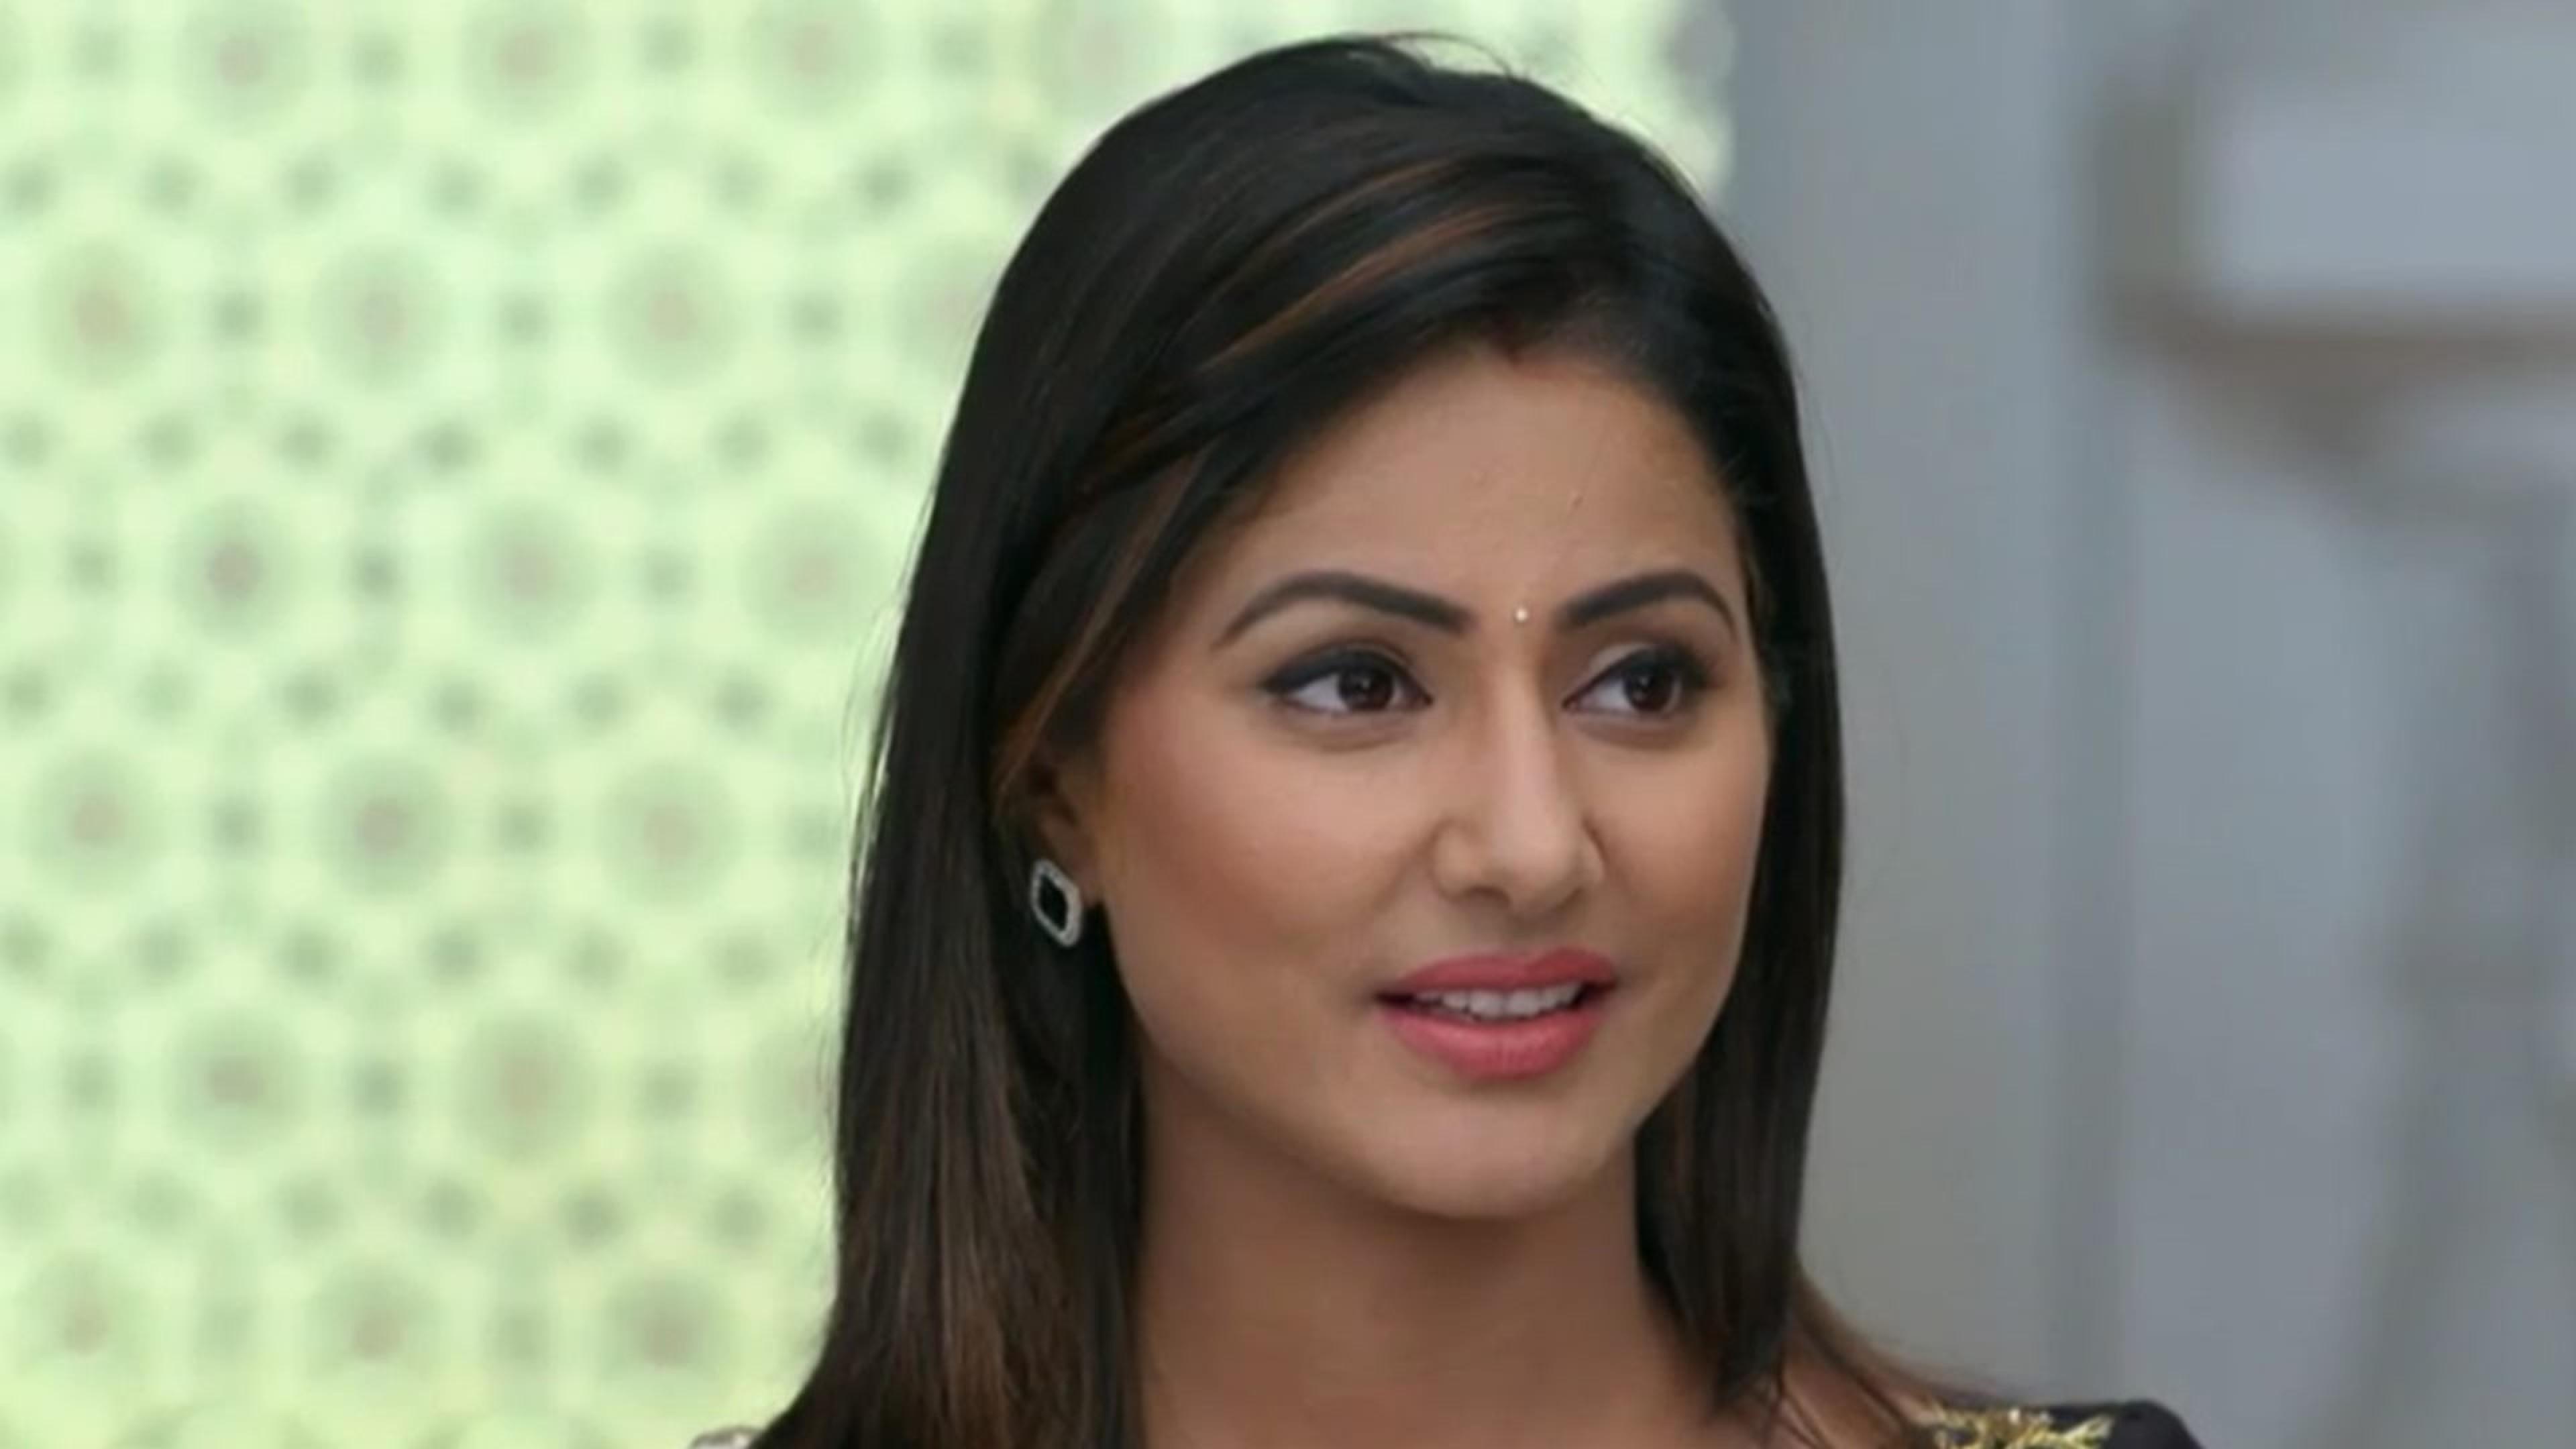 Hina Khan In Yeh Rishta Kya Kehlata Hai HD Wallpaper